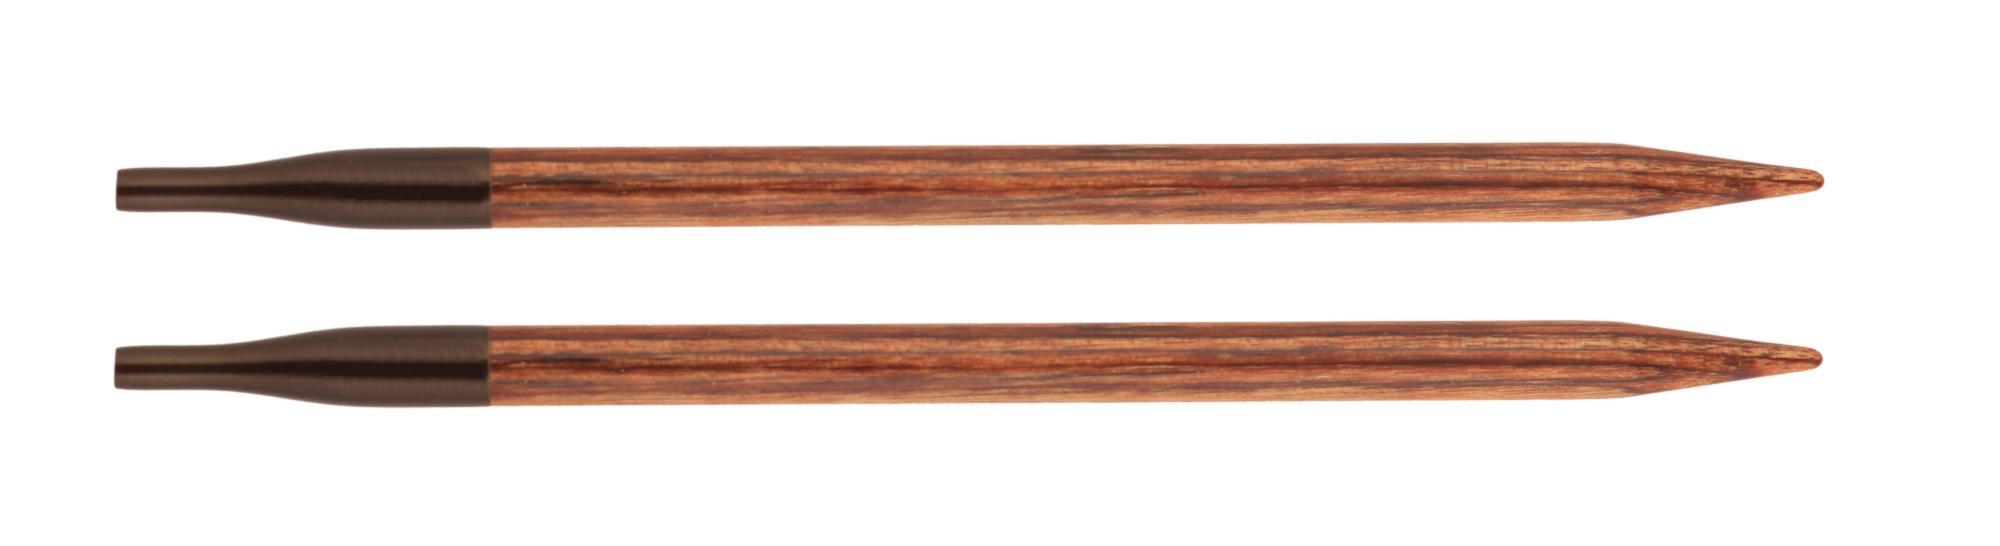 31213 Спицы съемные 9.00 мм Ginger KnitPro